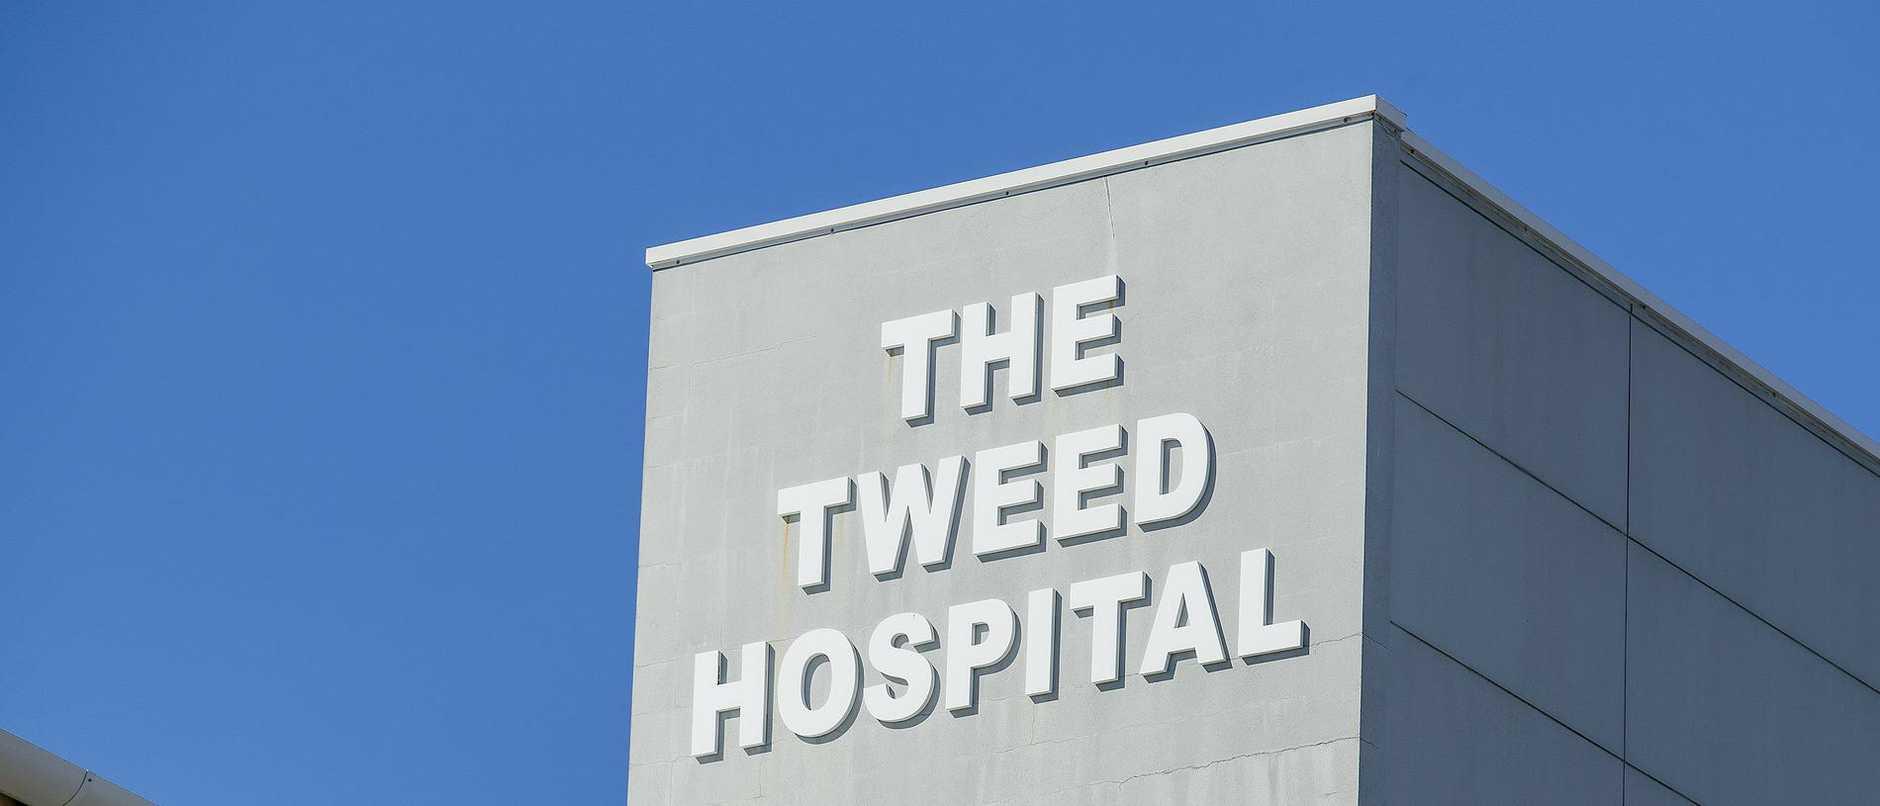 The Tweed Hospital